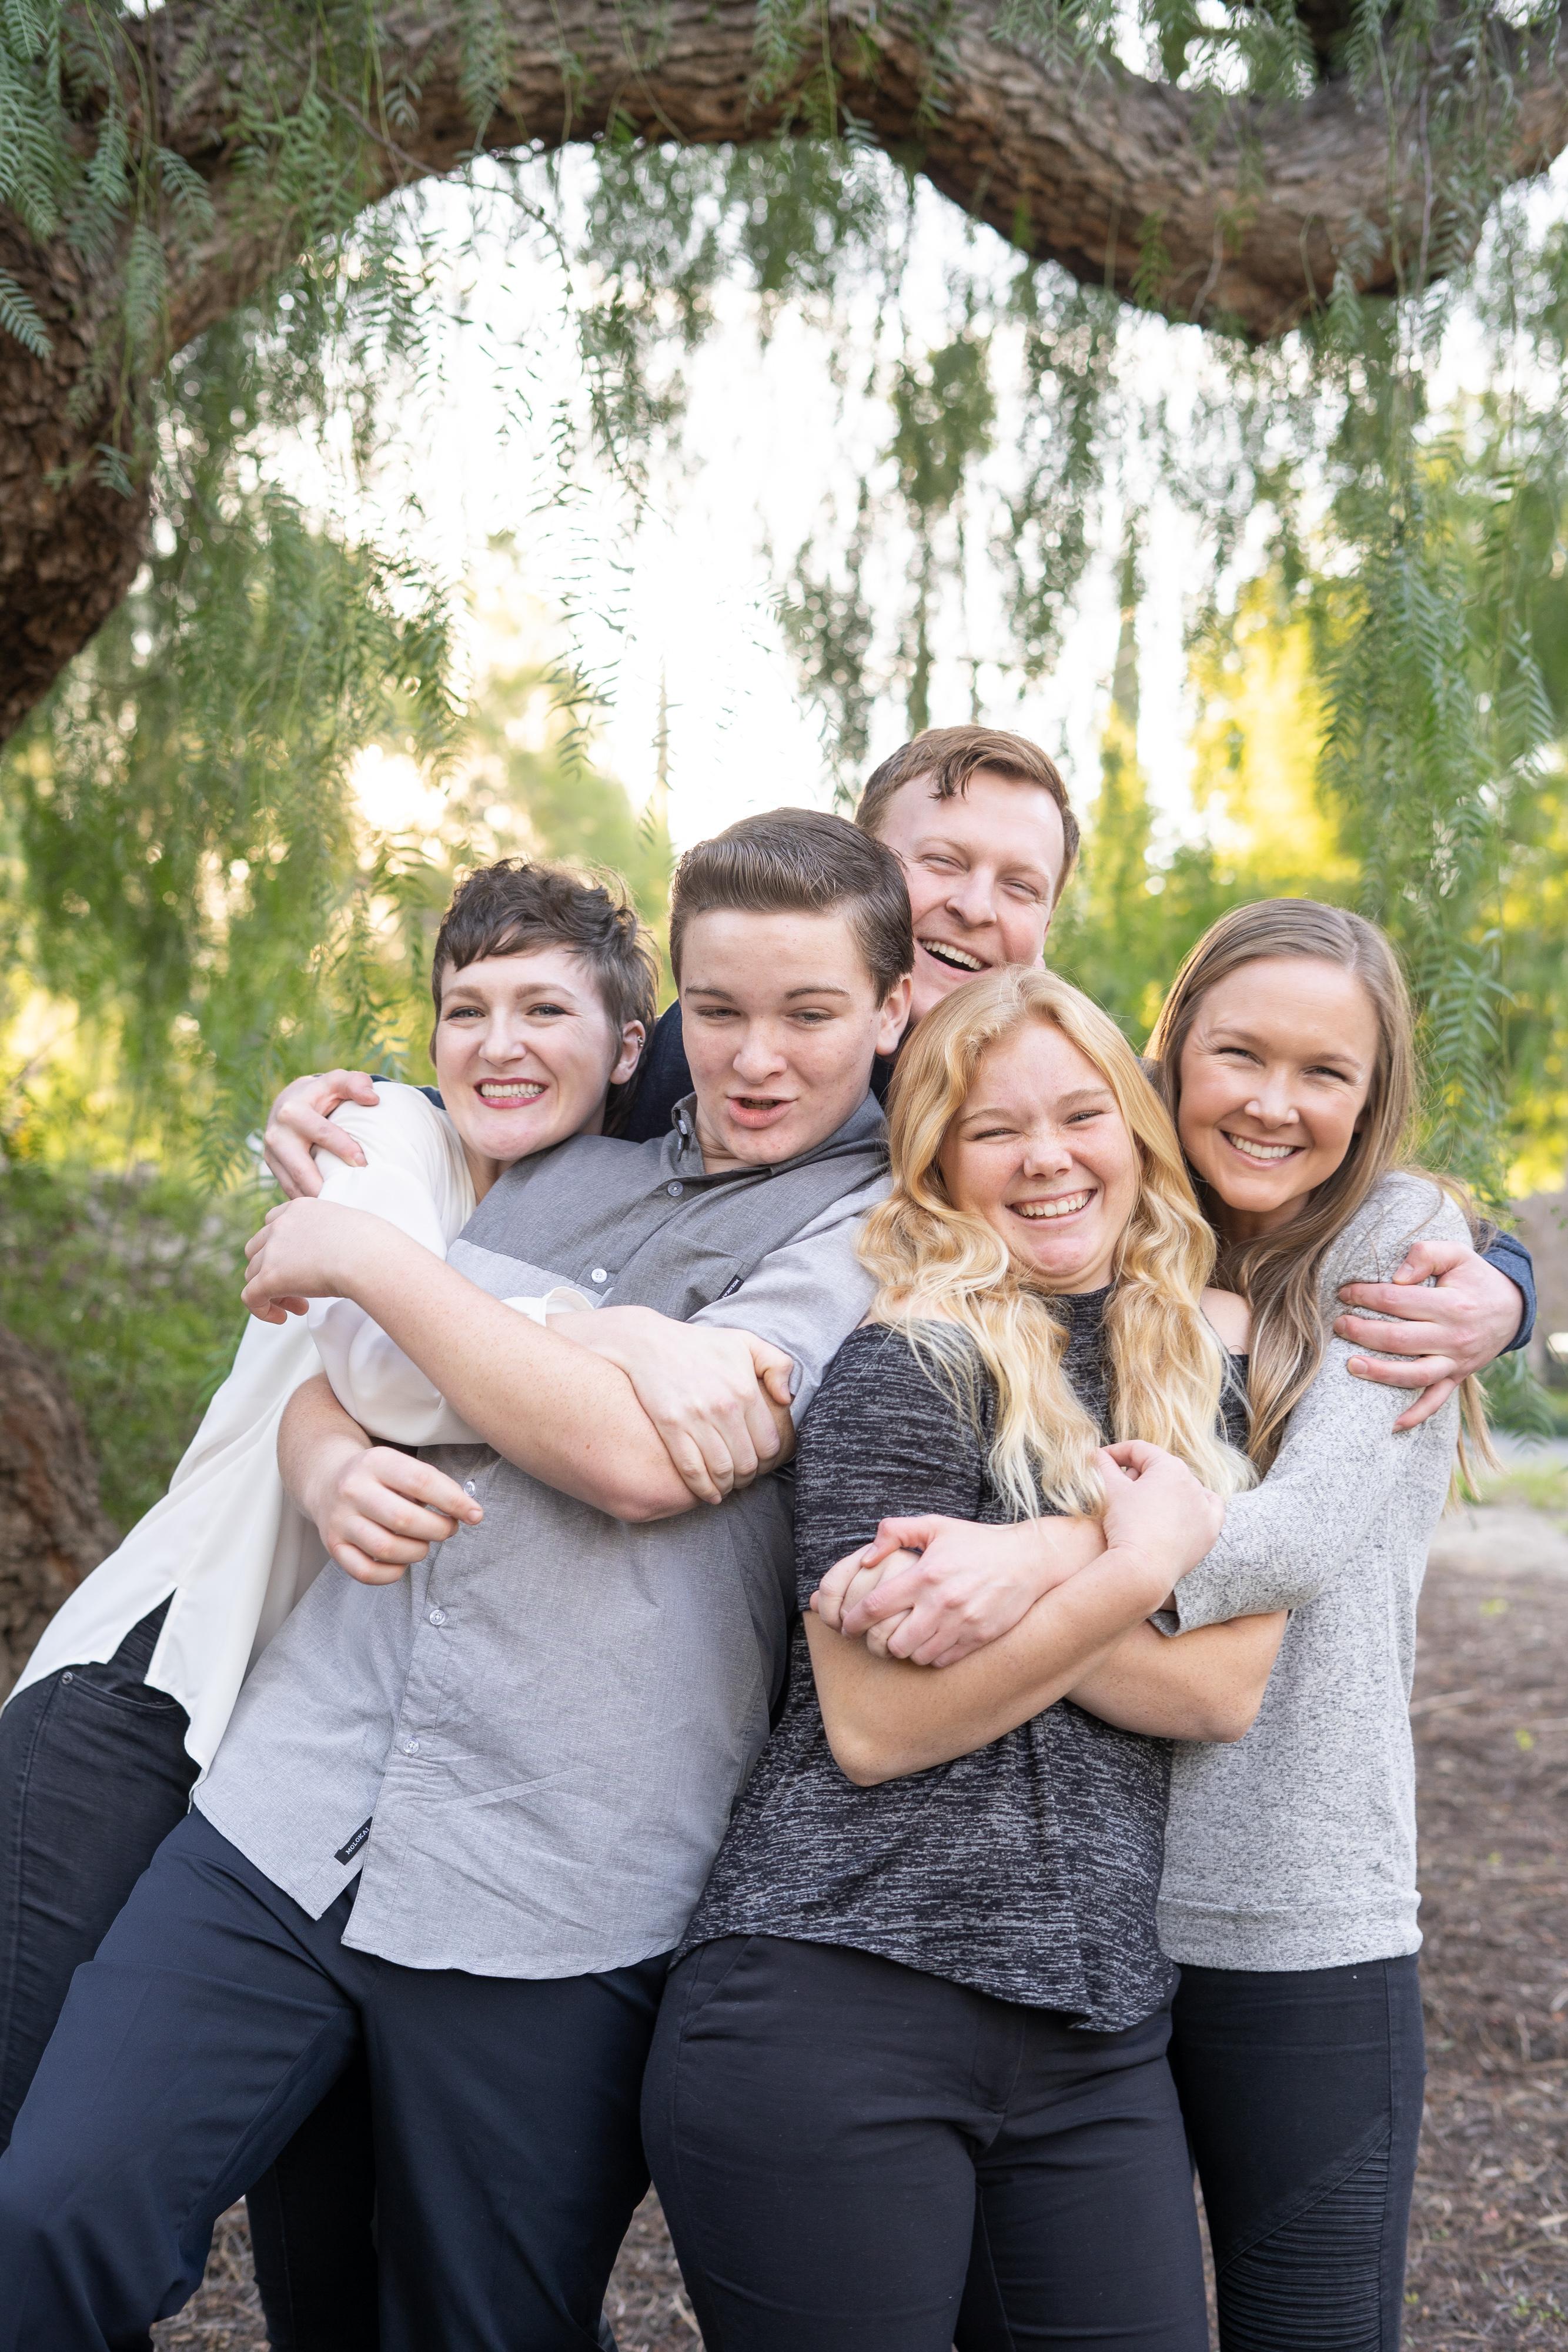 Family Photography | Rancho Cucamonga | Devonvp Photography